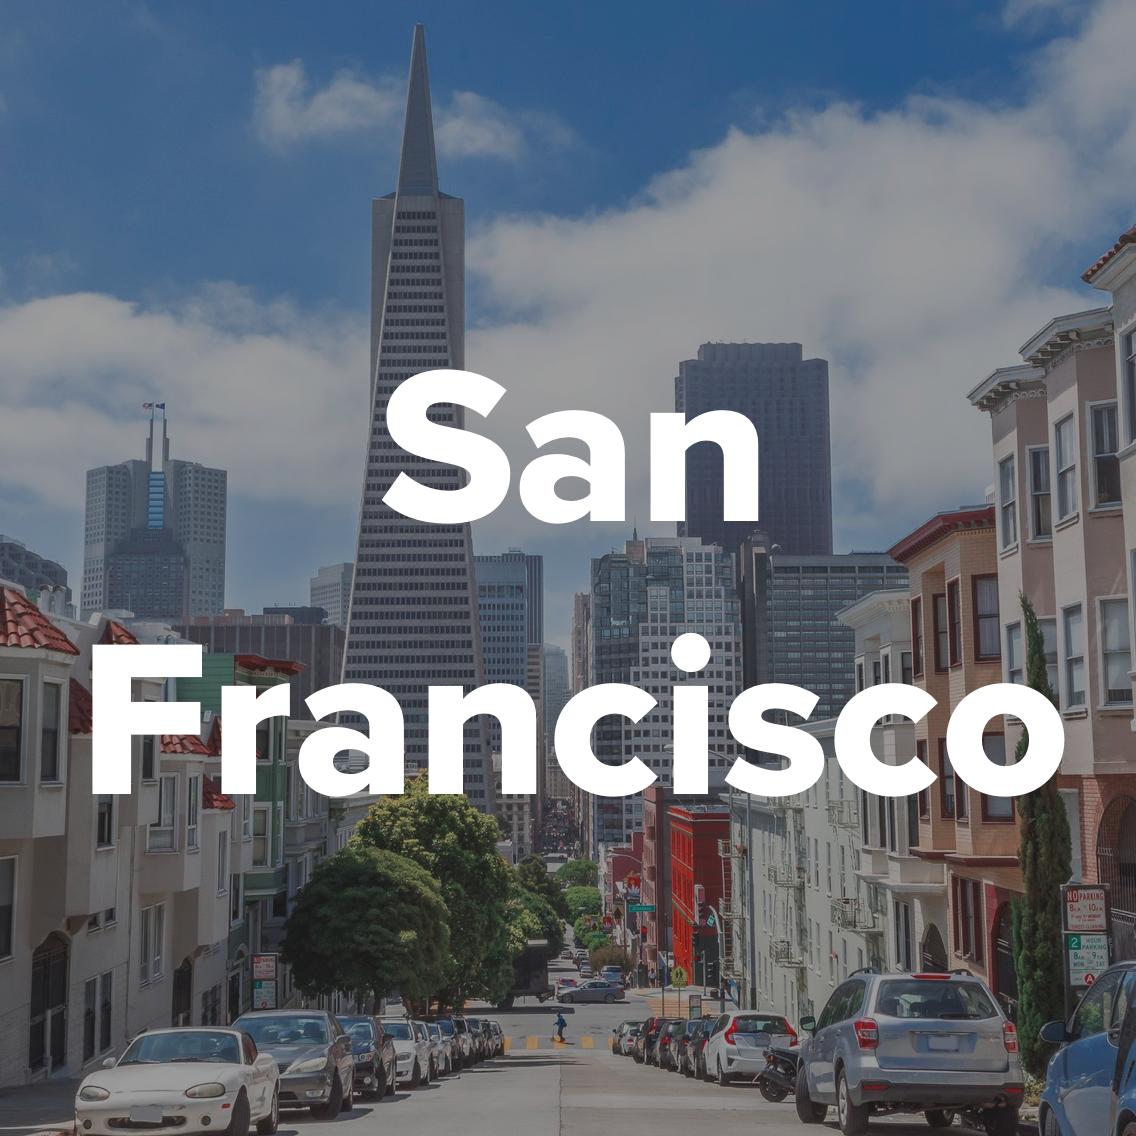 connect-roadshow-website-image-2020 - San Francisco